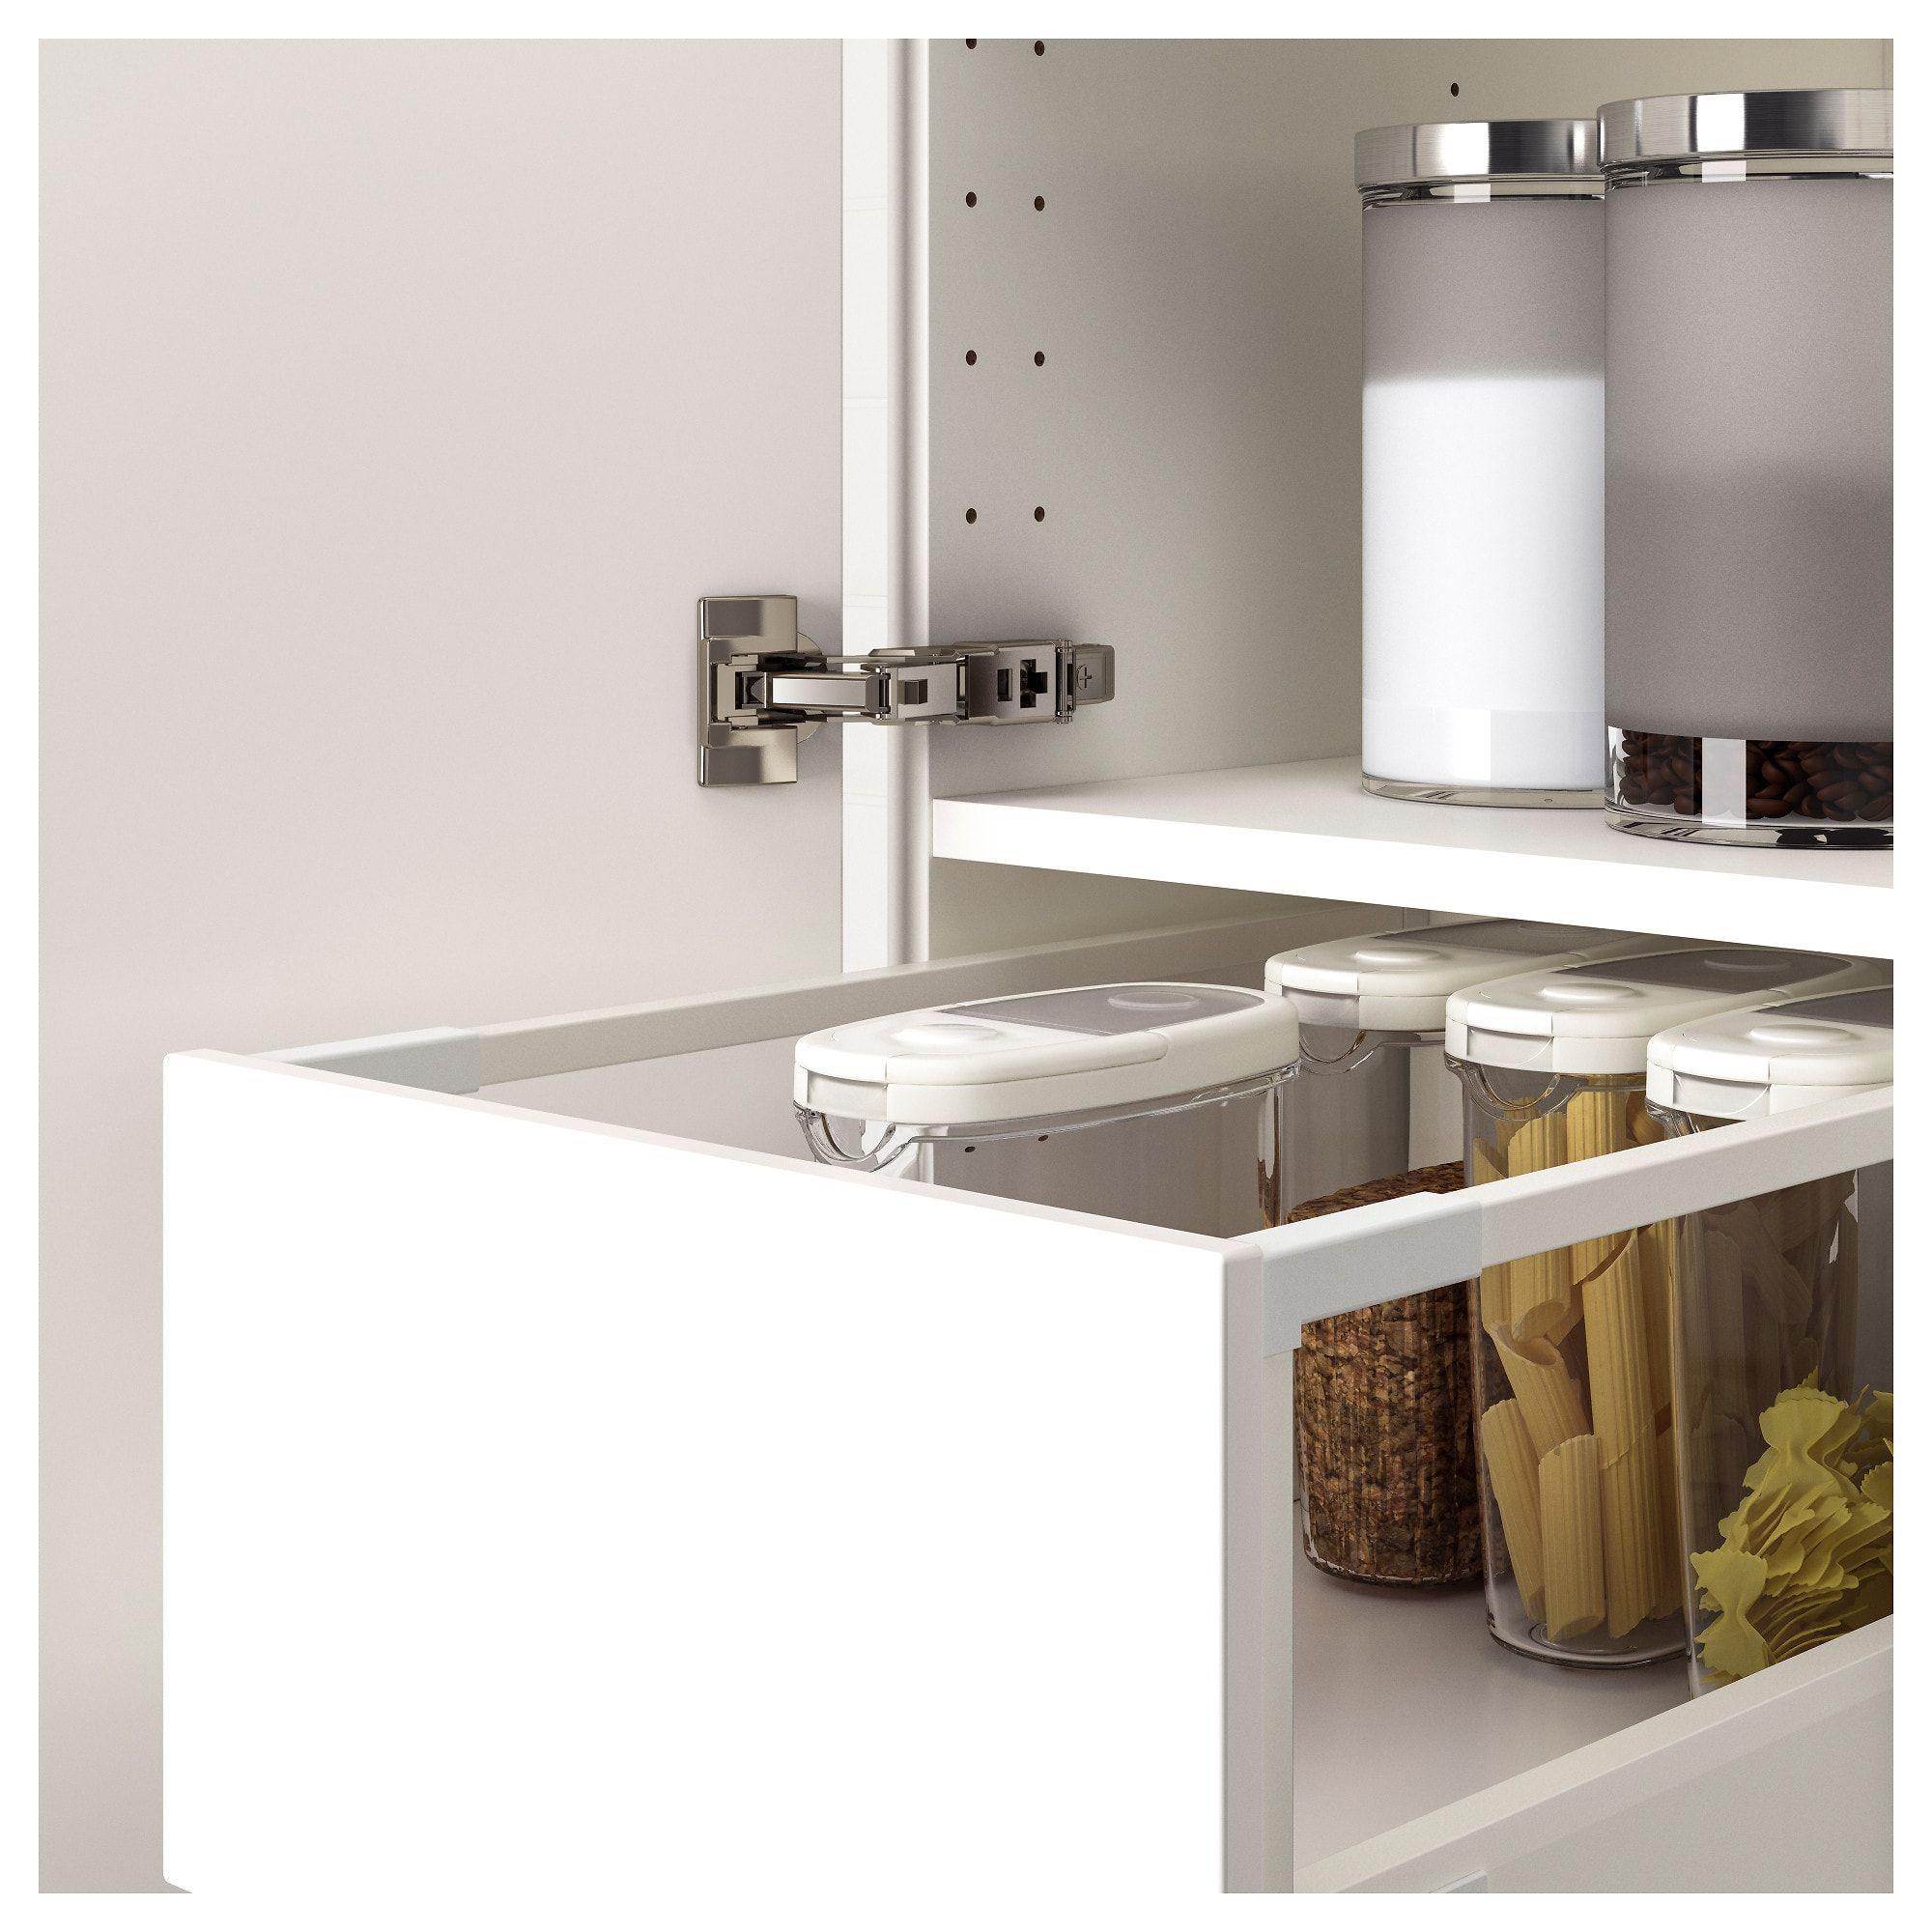 Meuble Cuisine Ikea Vide Sanitaire ikea utrusta hinge | products in 2019 | kitchen hinges, ikea